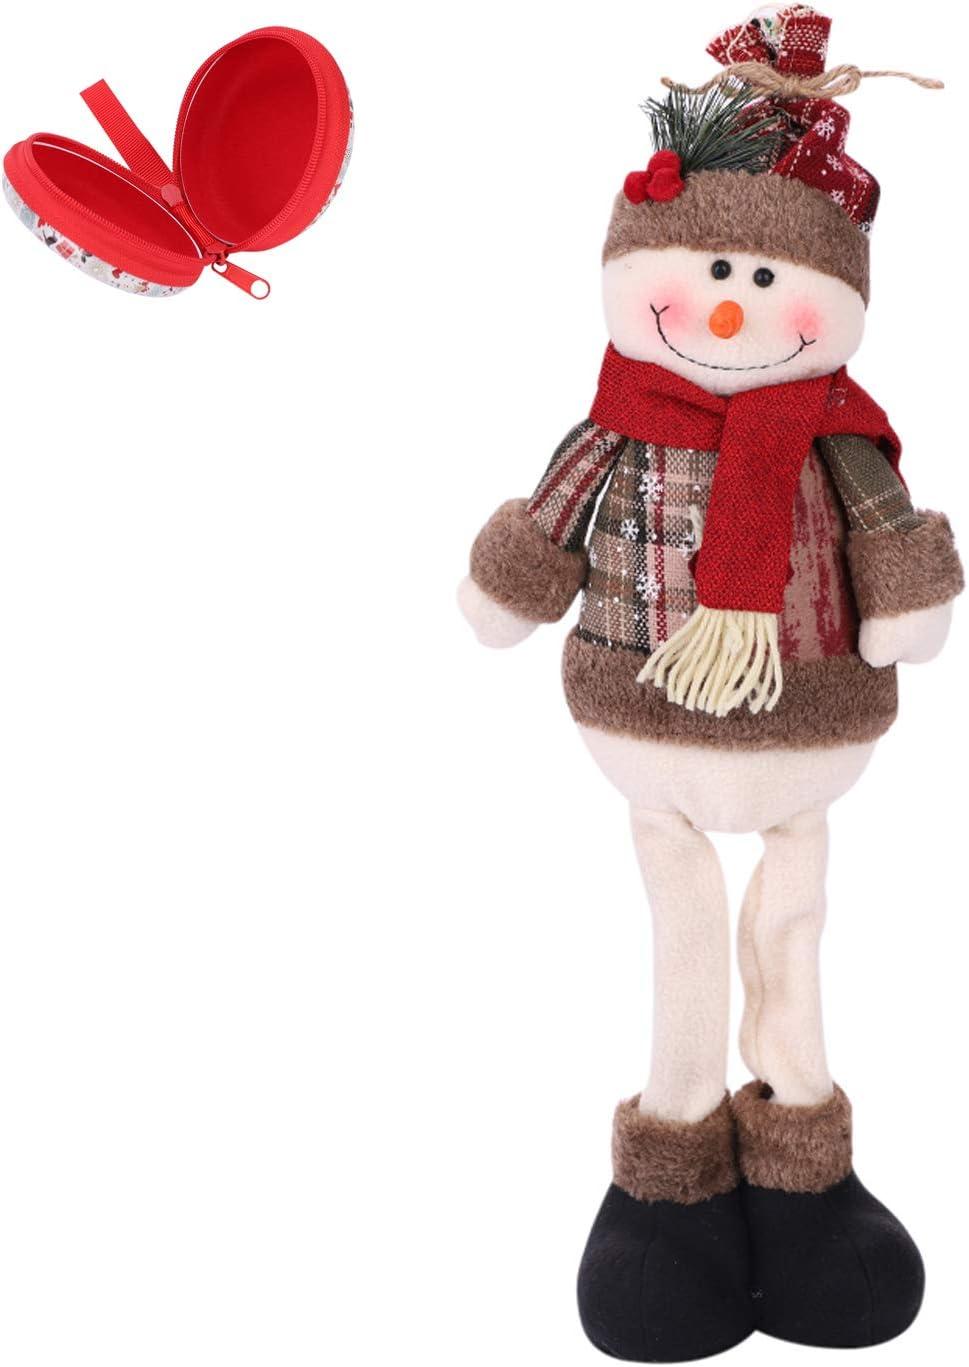 35% Max 58% OFF OFF ITODA Christmas Plush Decor Dolls Snowma Long Shelf Standing Leg